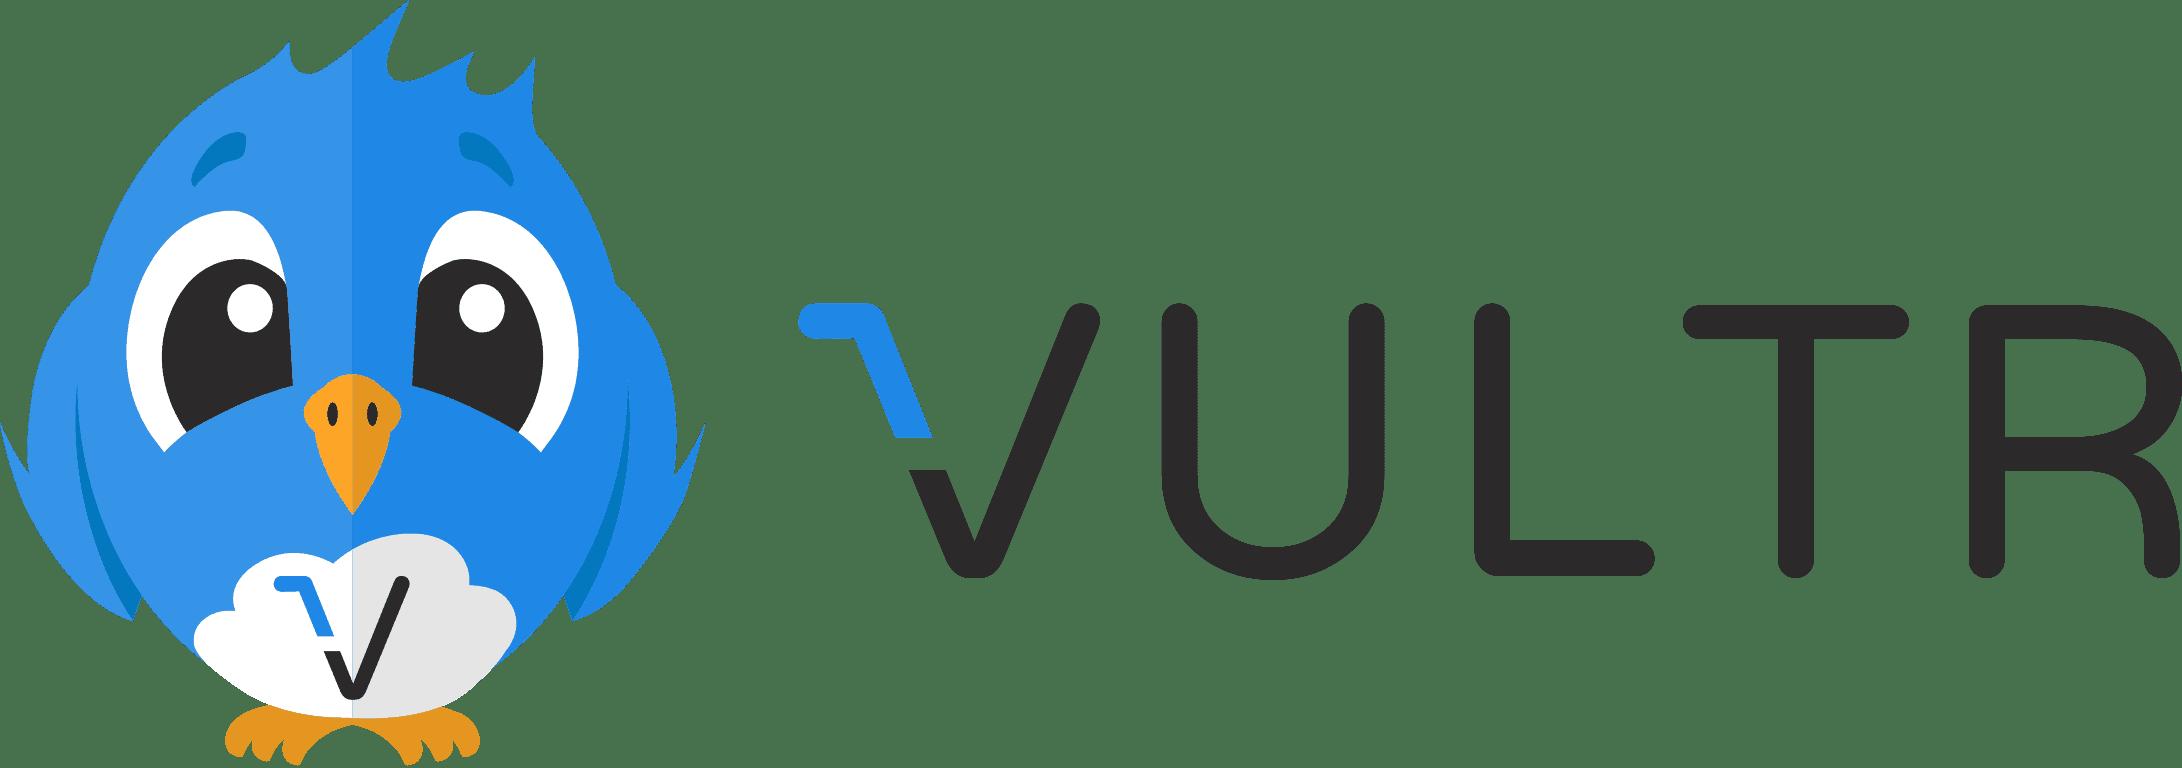 How to Setup WordPress blog with Vultr - DevStack